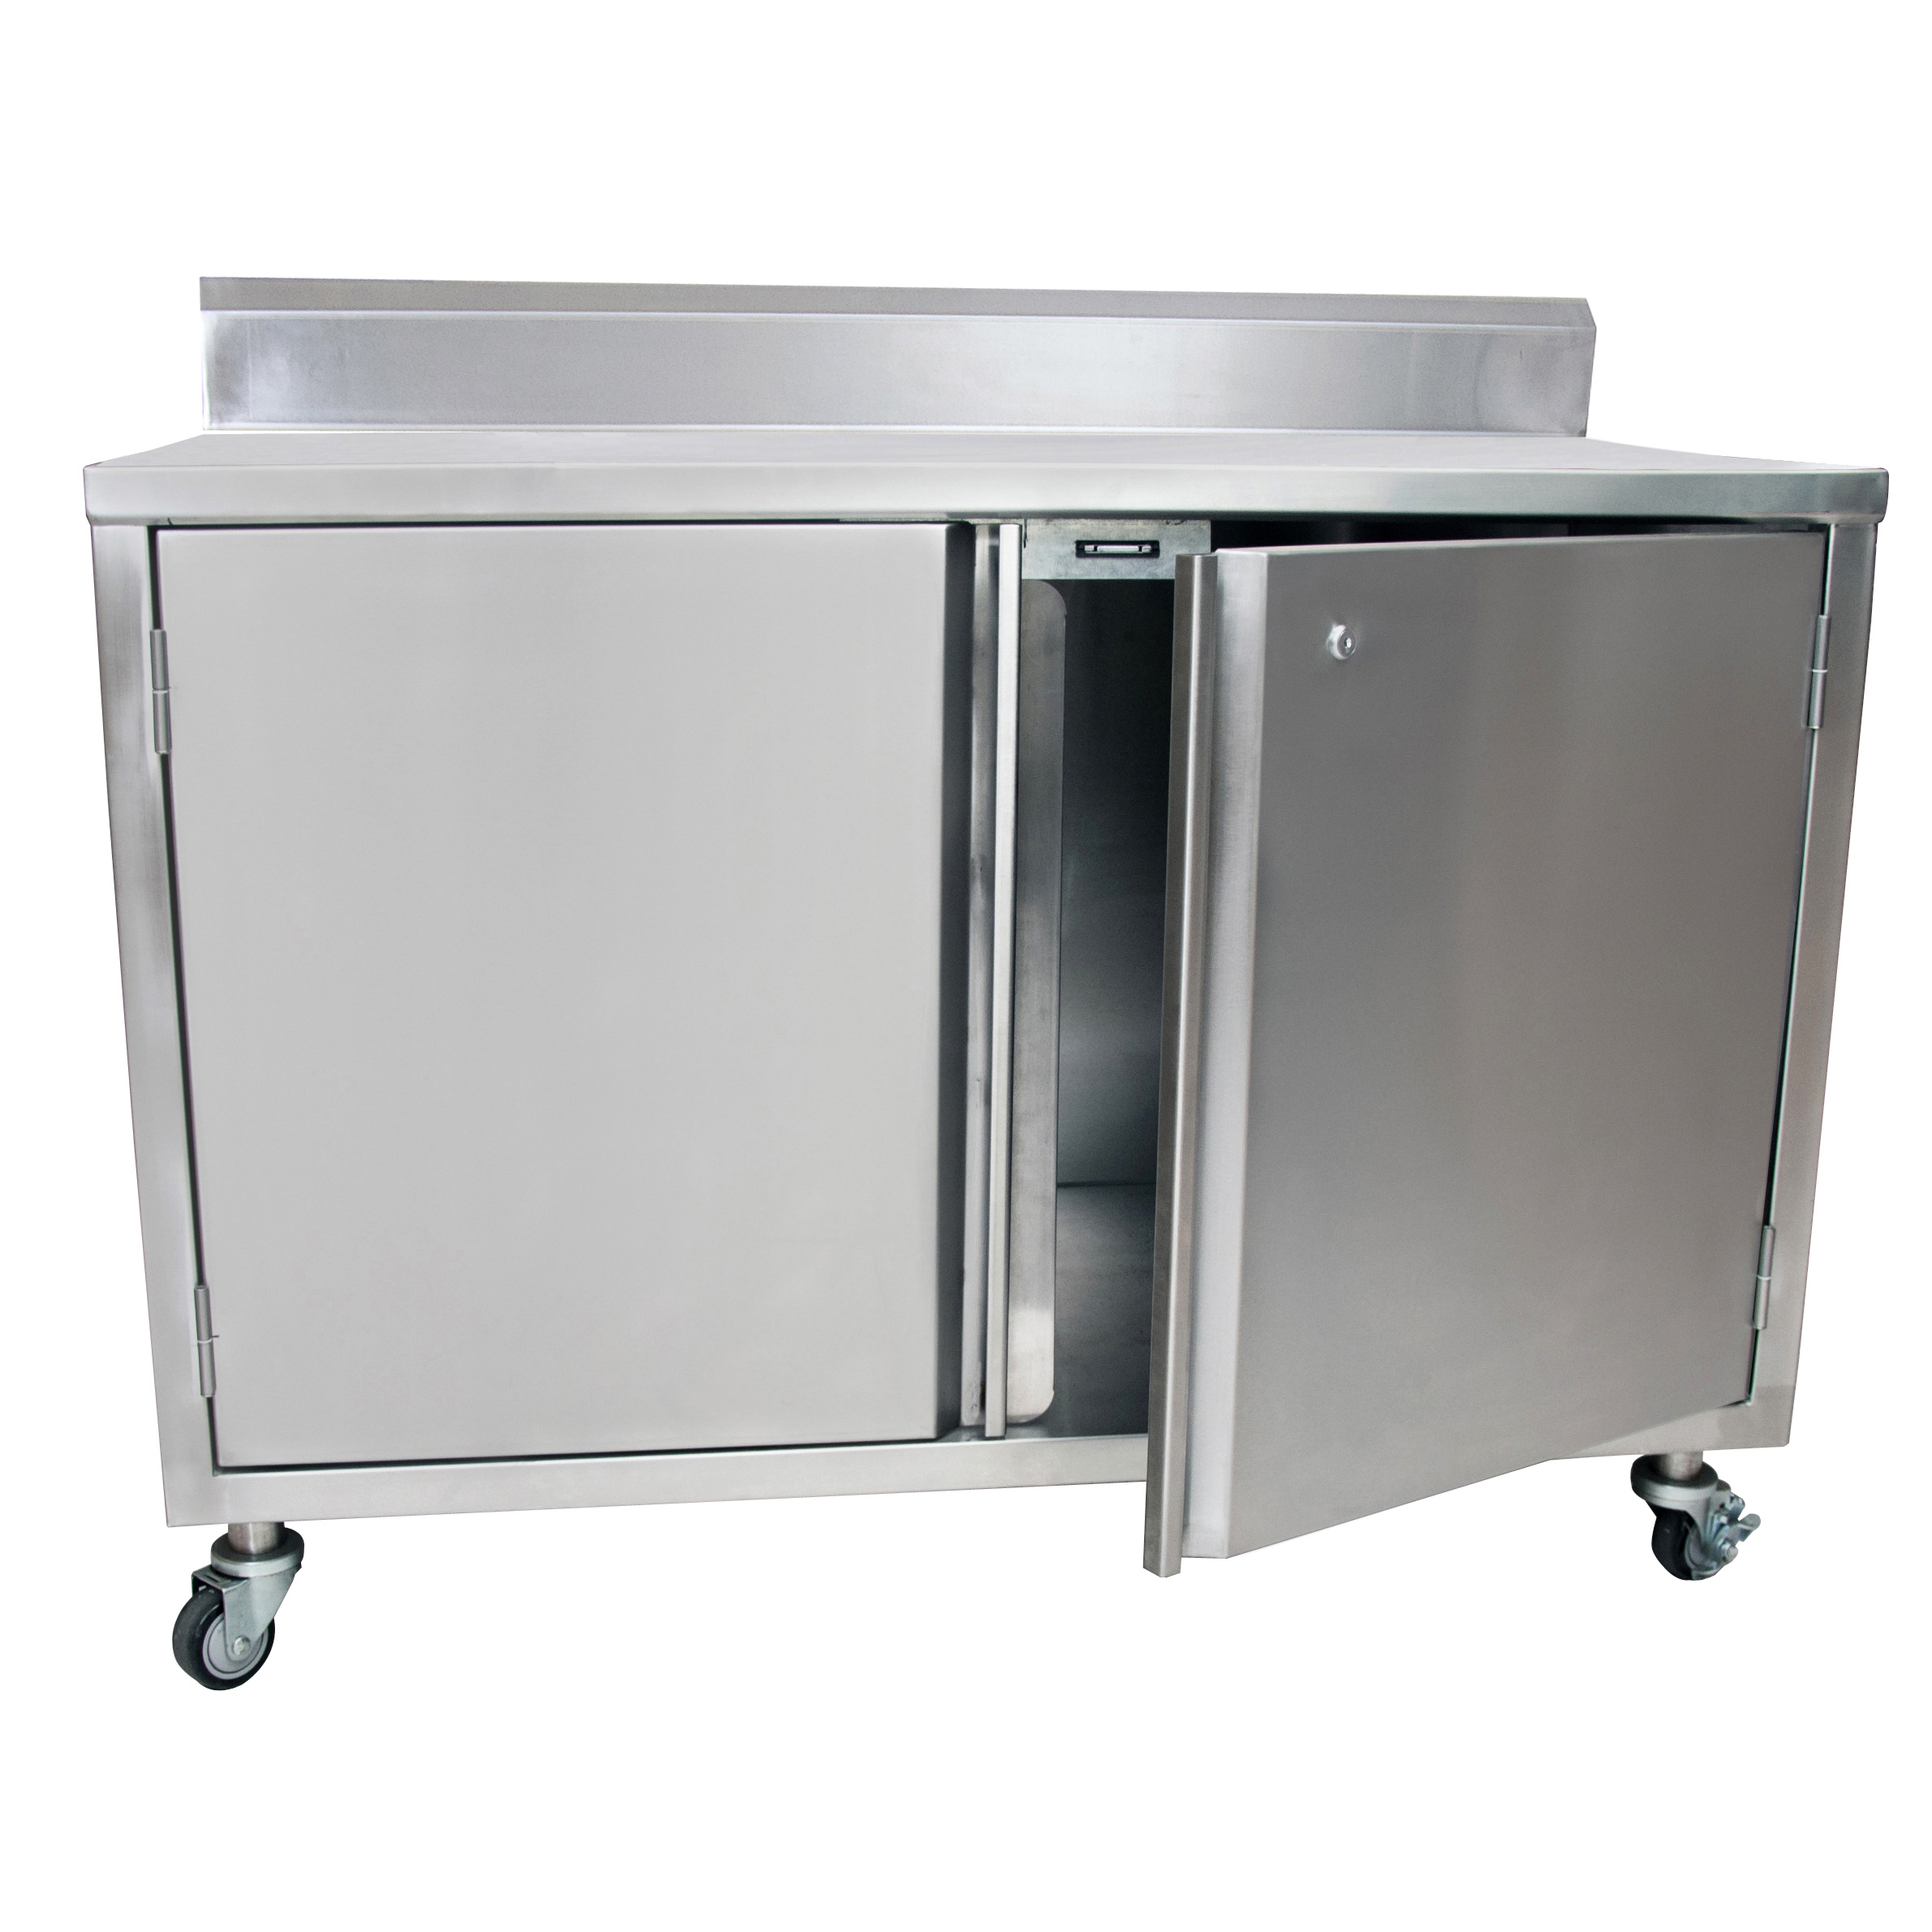 BK Resources BKDCR5-2460HL work table, cabinet base hinged doors